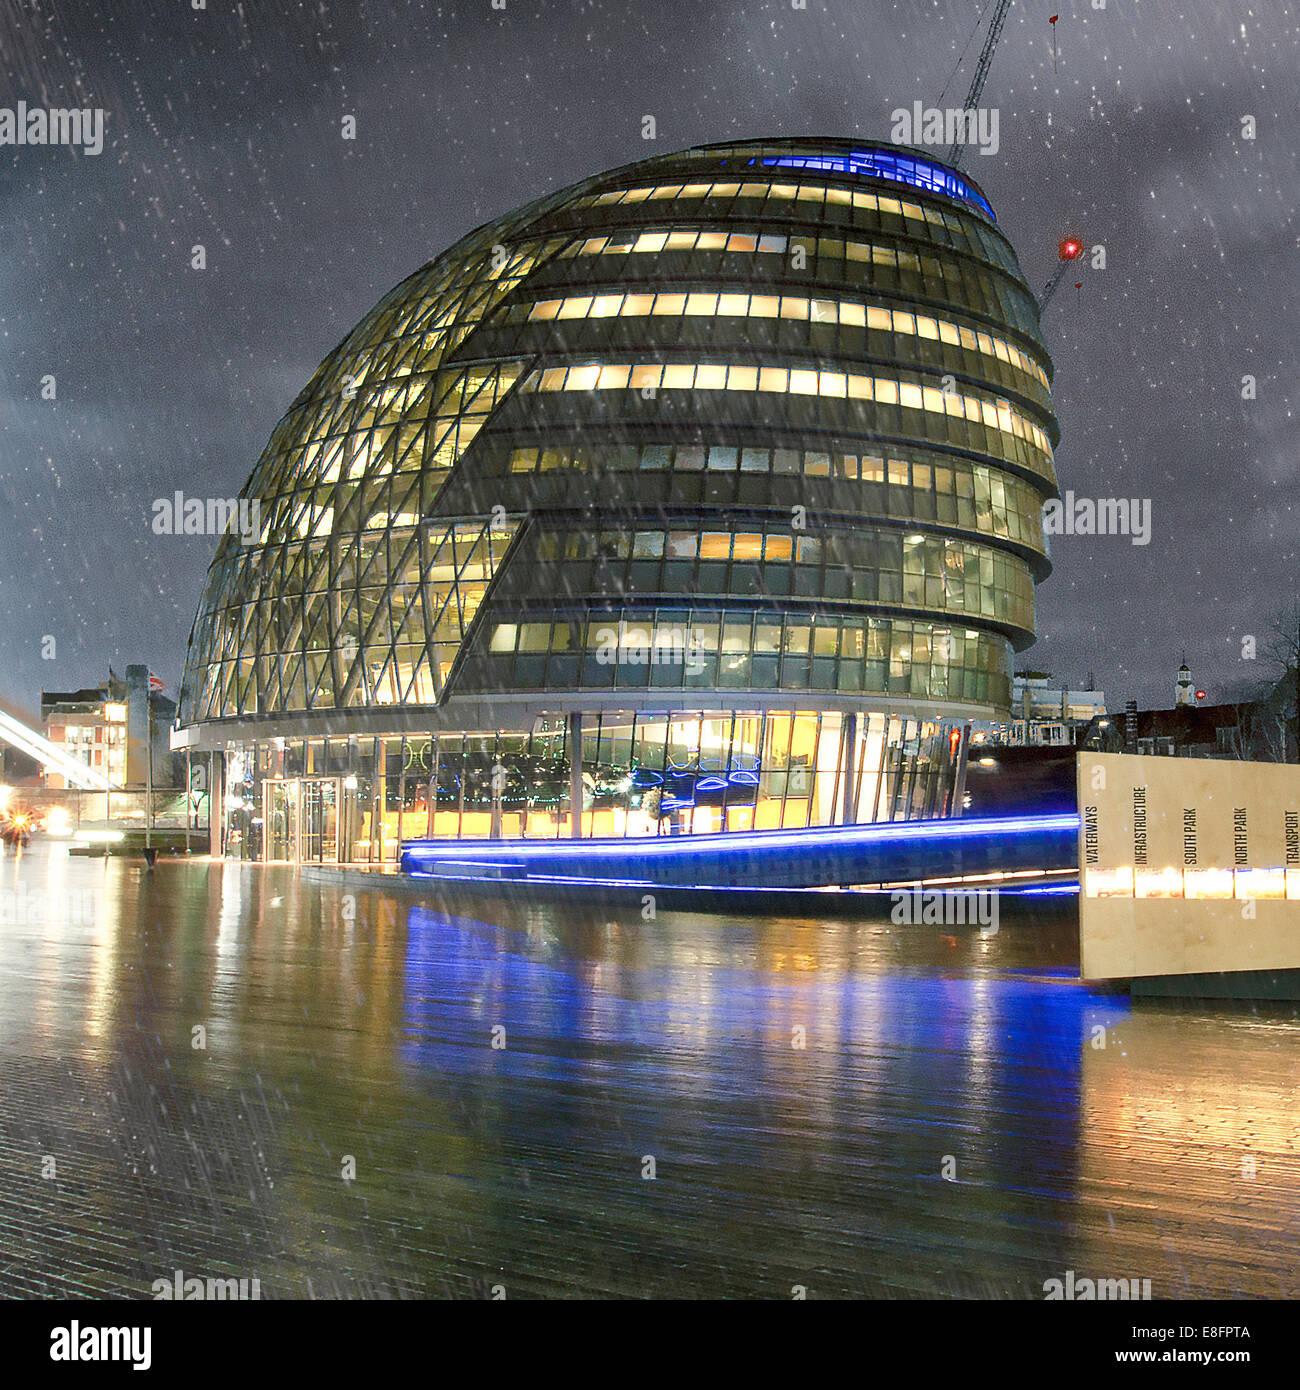 City Hall in the rain, London, England, UK - Stock Image